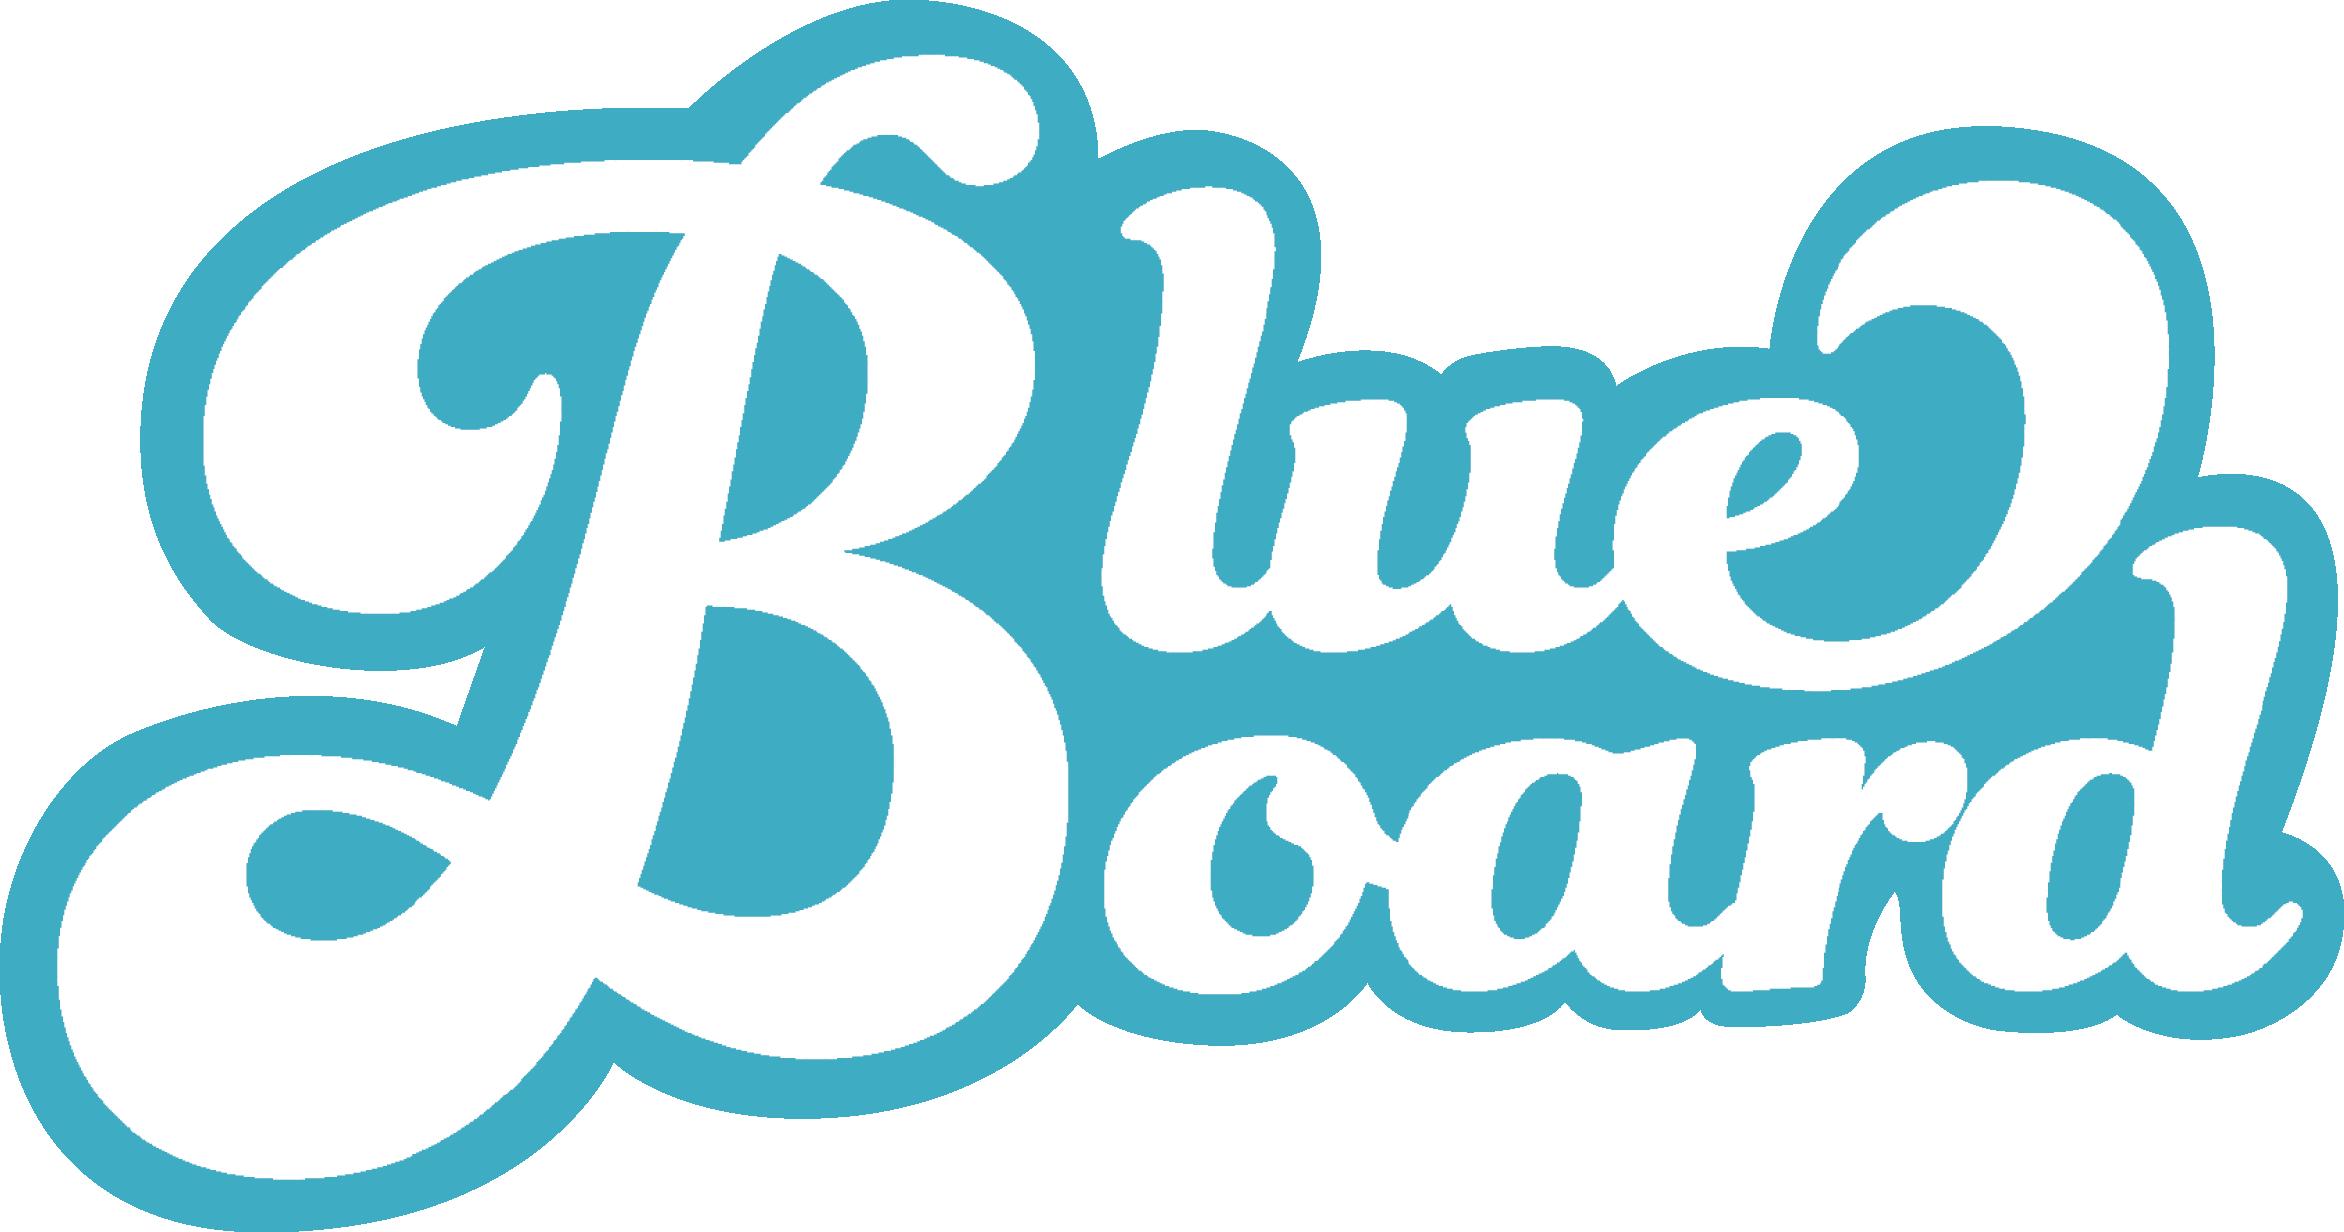 2019 Blueboard Logo 2C.png